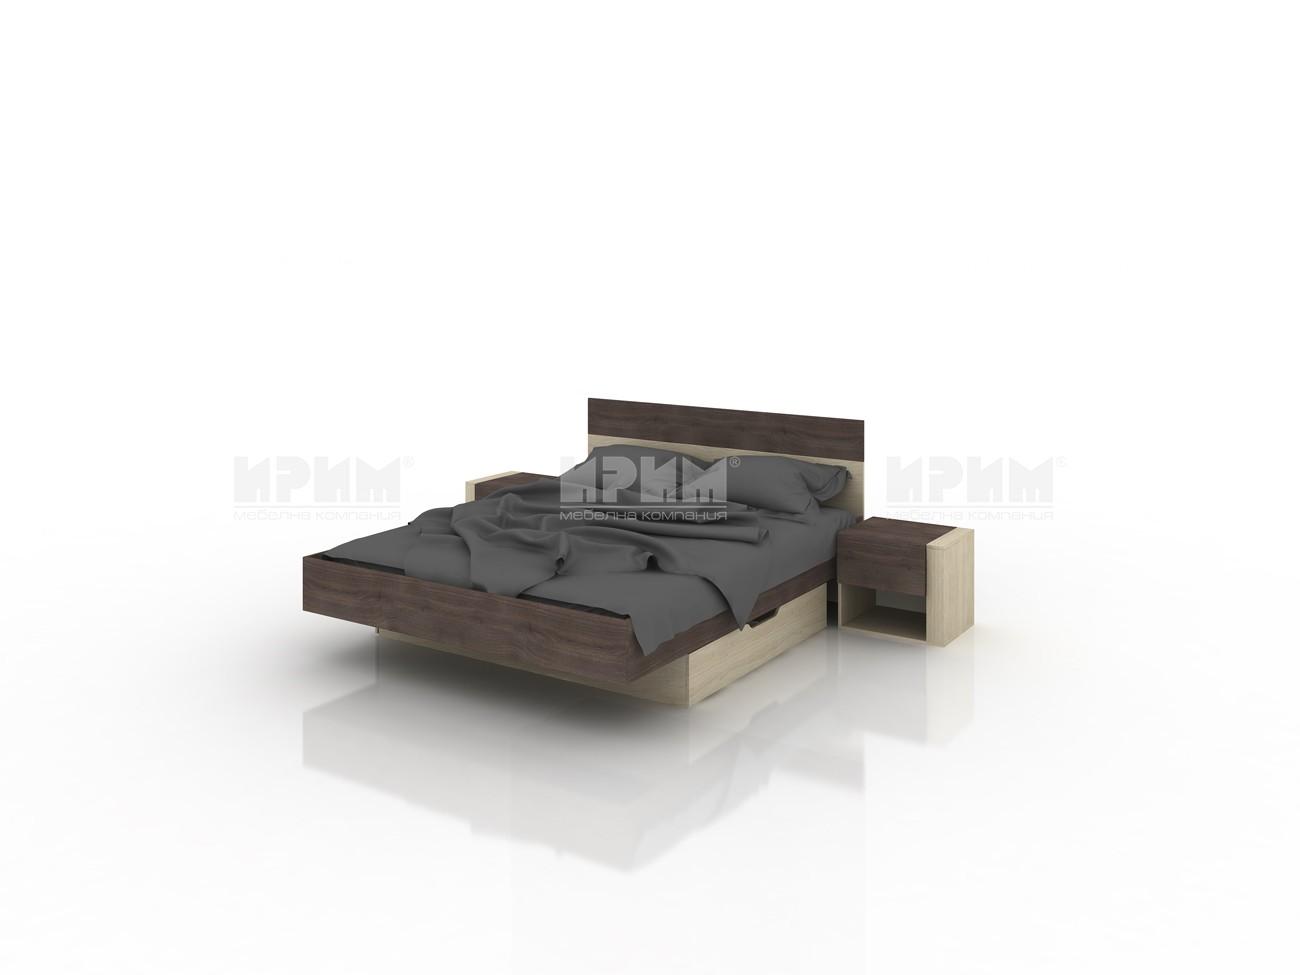 Спален комплект Ирим Фабио City 490